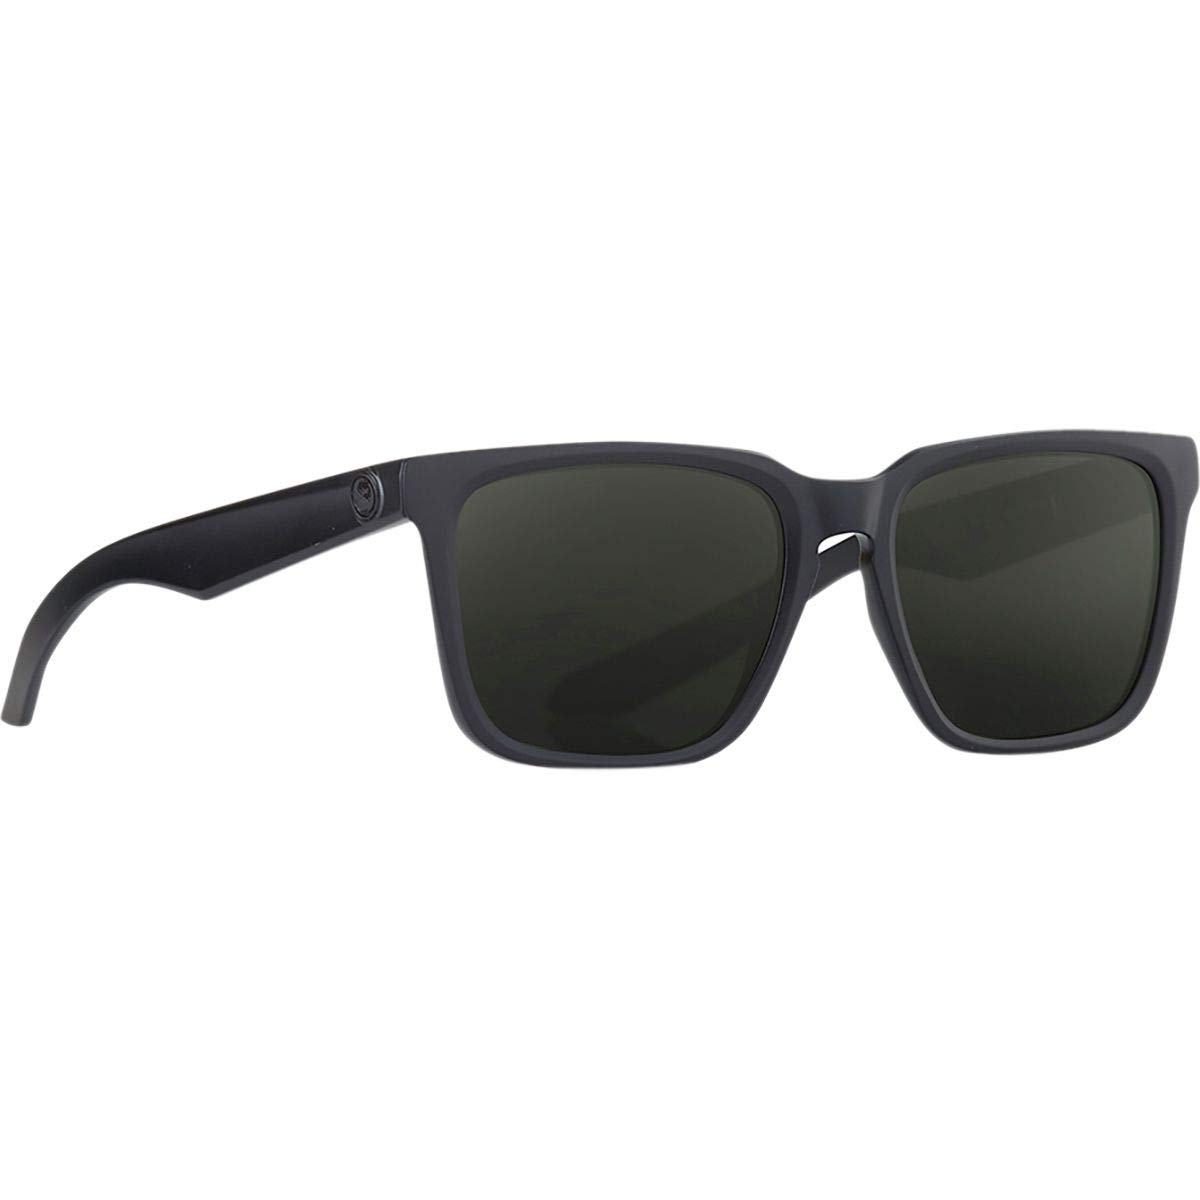 Sunglasses DRAGON DR BAILE POLAR 004 MATTE BLACK/GREY at ...